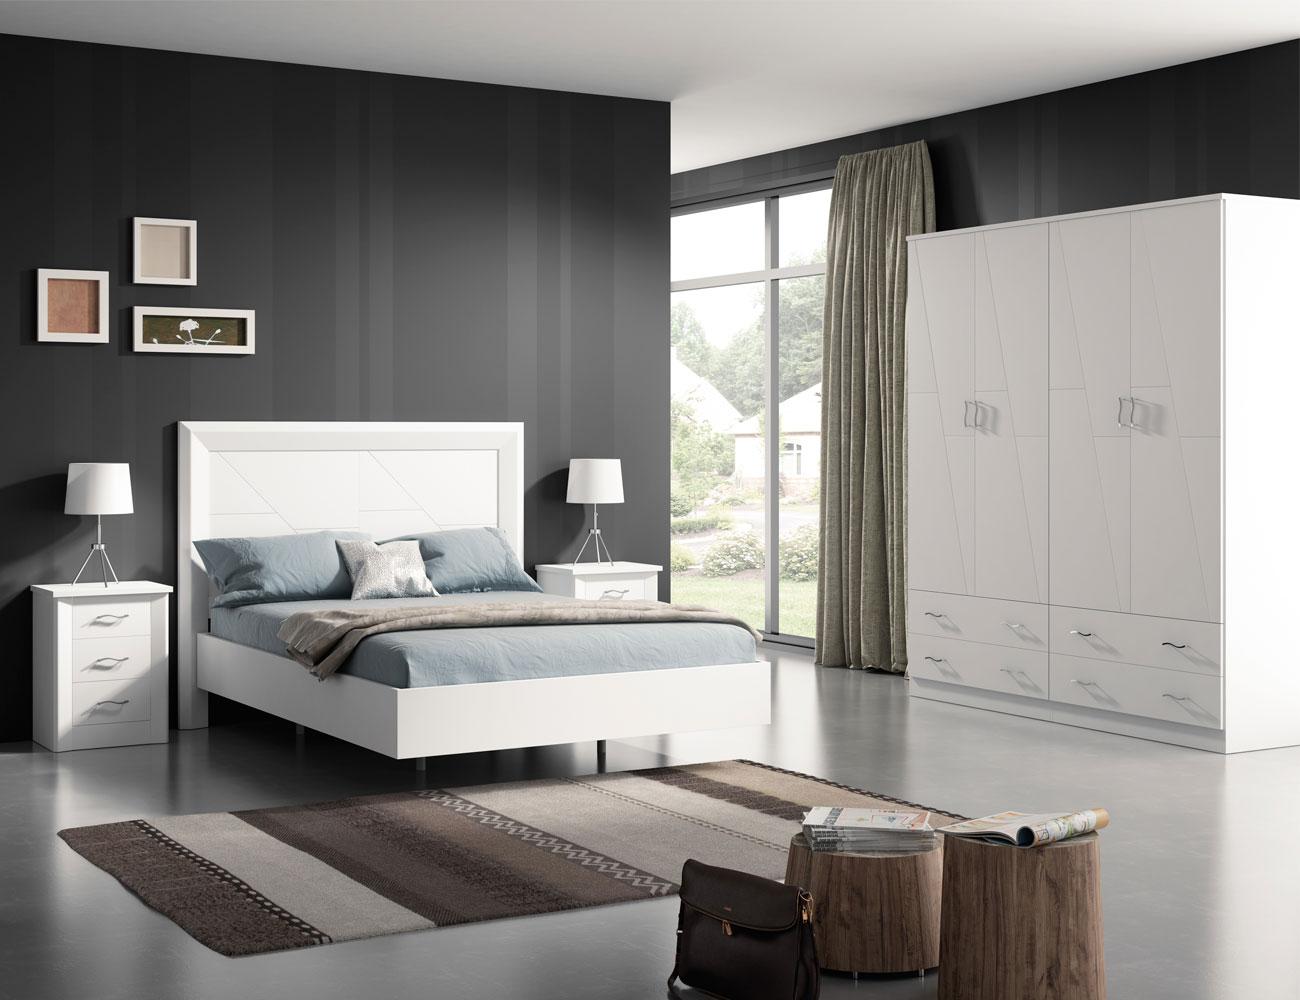 3 dormitorio matrimonio madera dm blanco lacado1